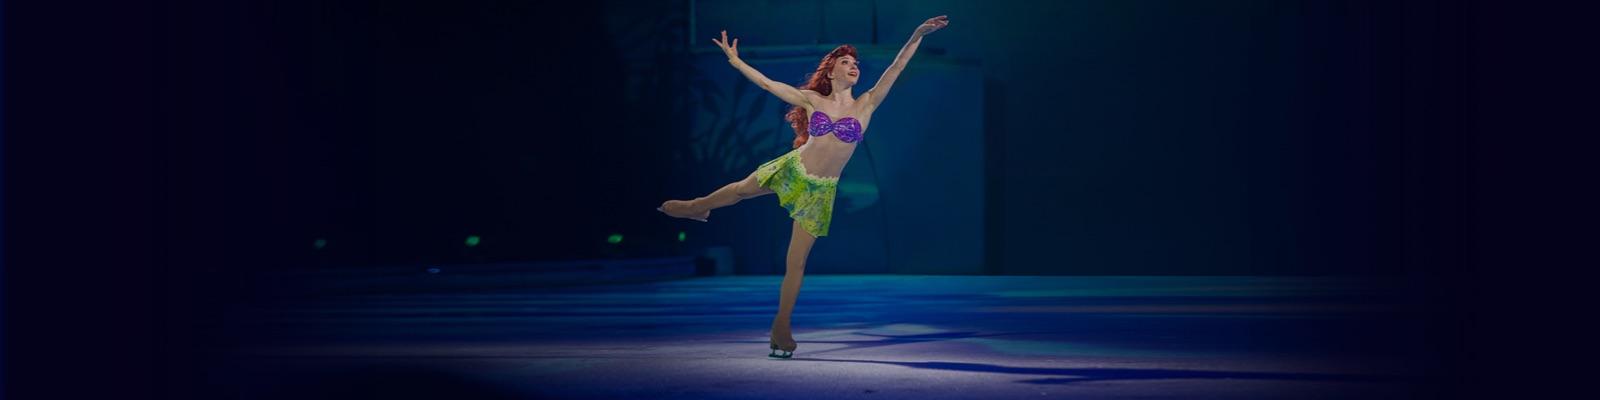 Inside Disney On Ice - Category SHOWS